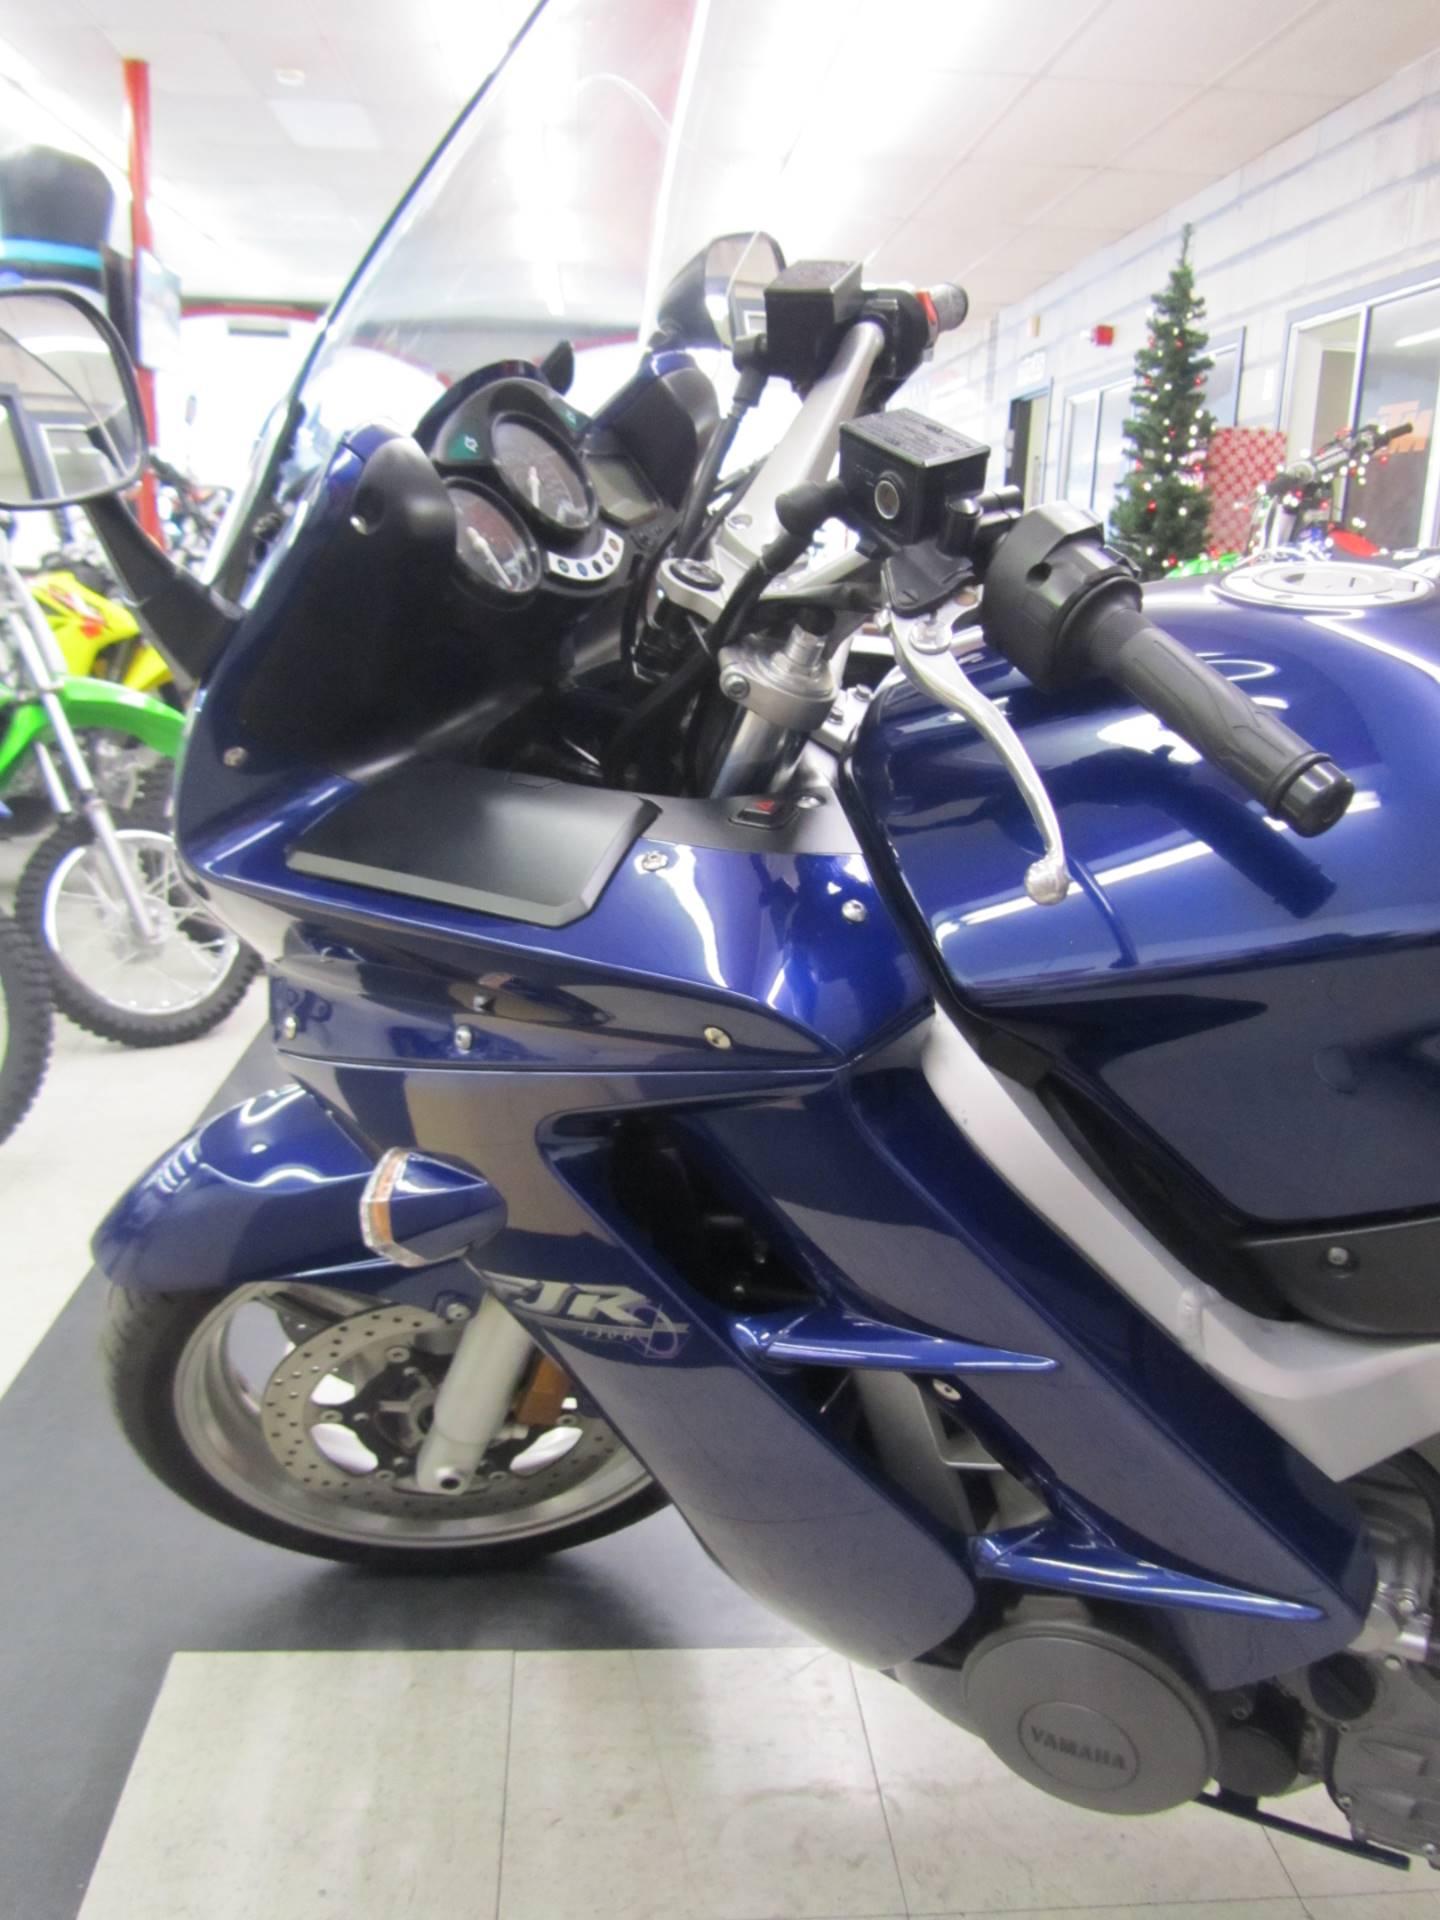 2005 Yamaha FJR 1300A 3